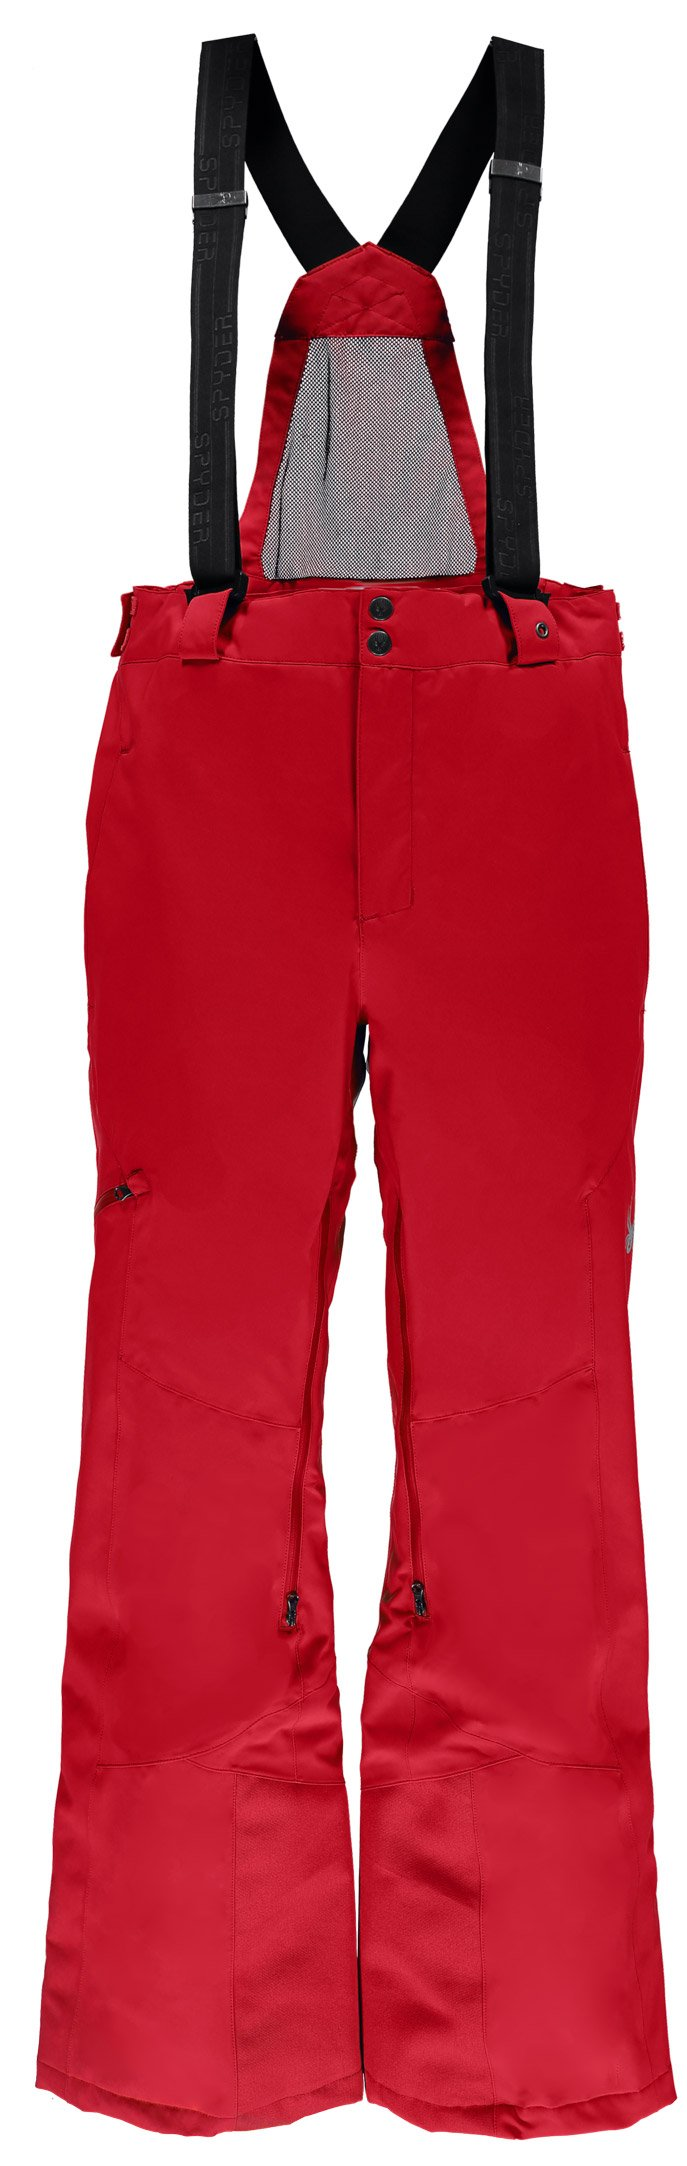 Spyder boys Leader 783367-PANT-600_2XL - Red